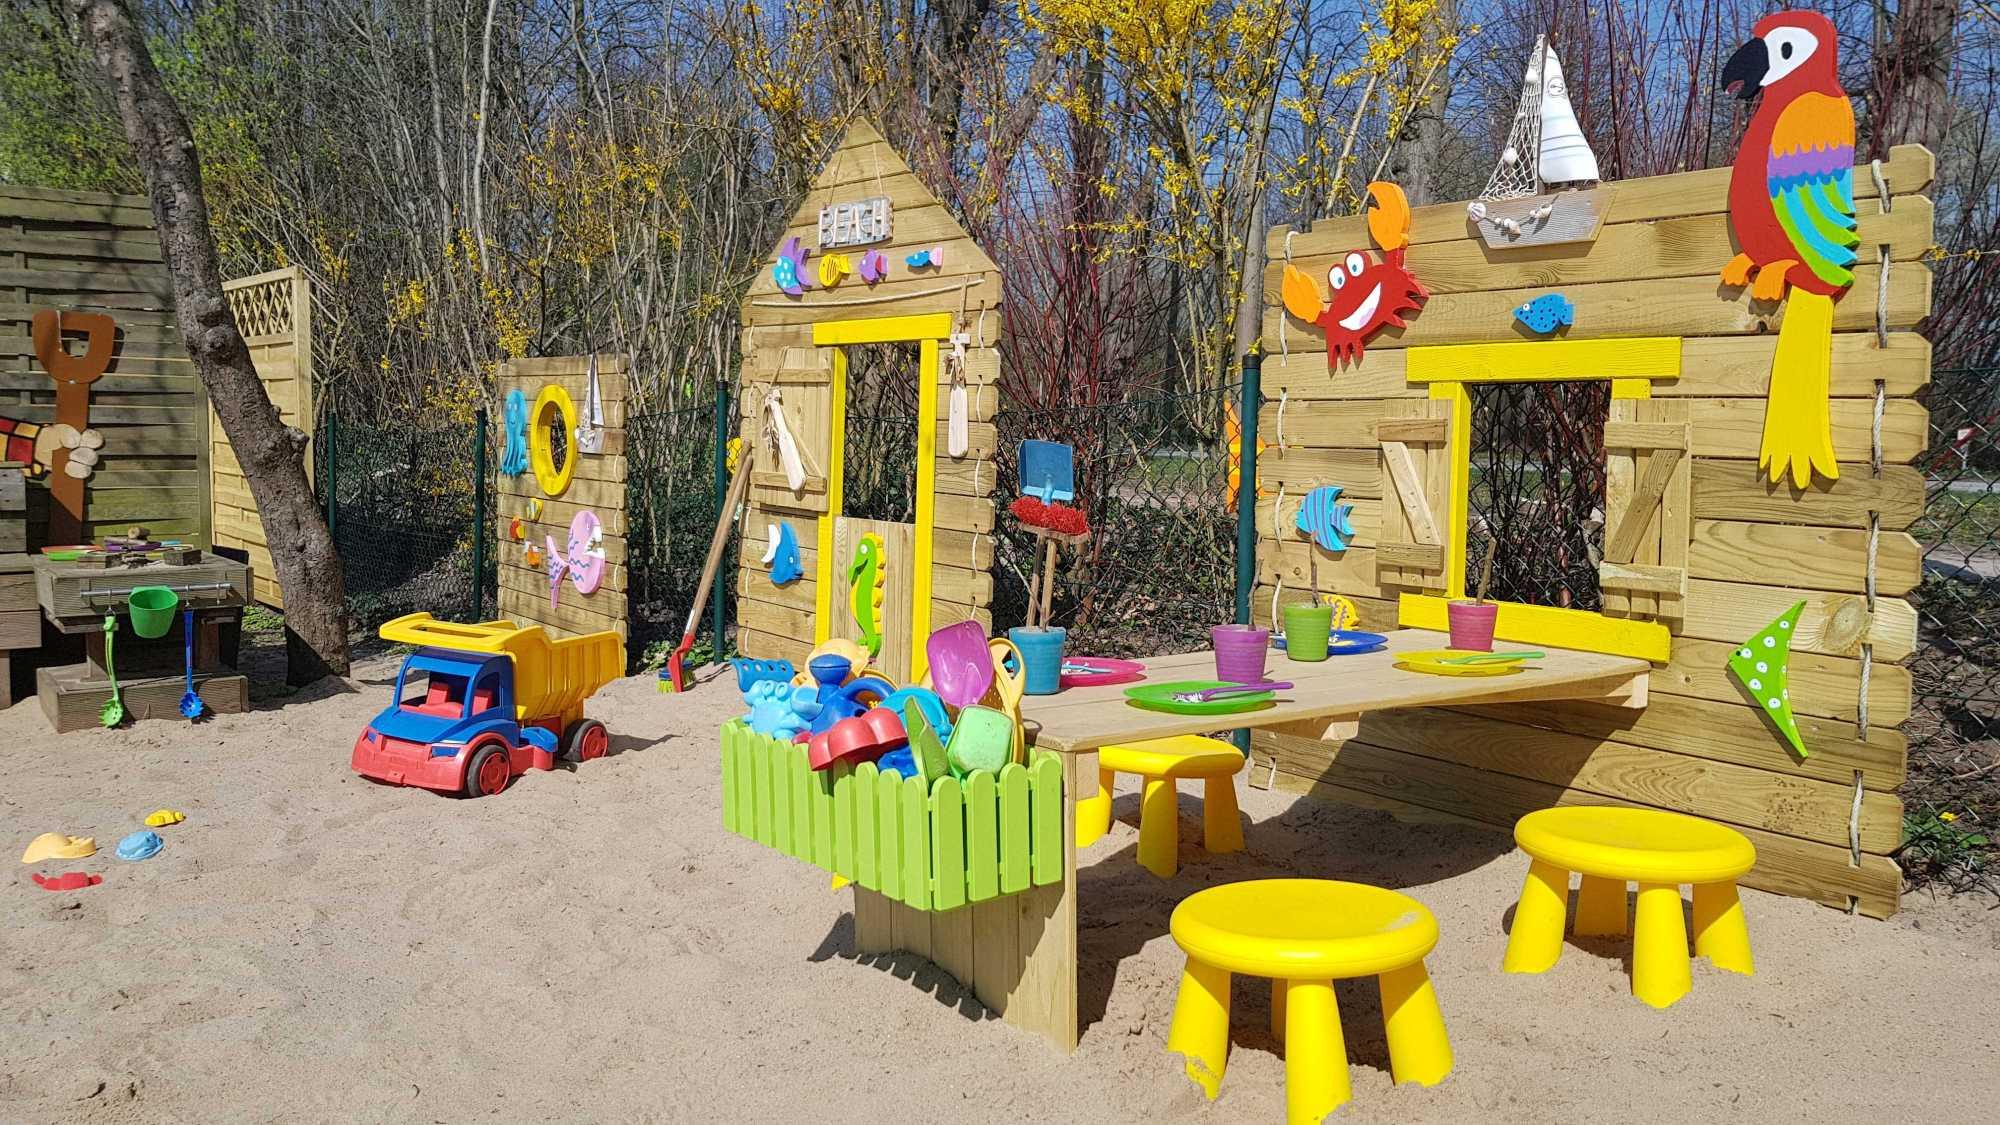 Kita Kid Zone Kinderbetreuung Garten1 17 - Kinder-Beachclub